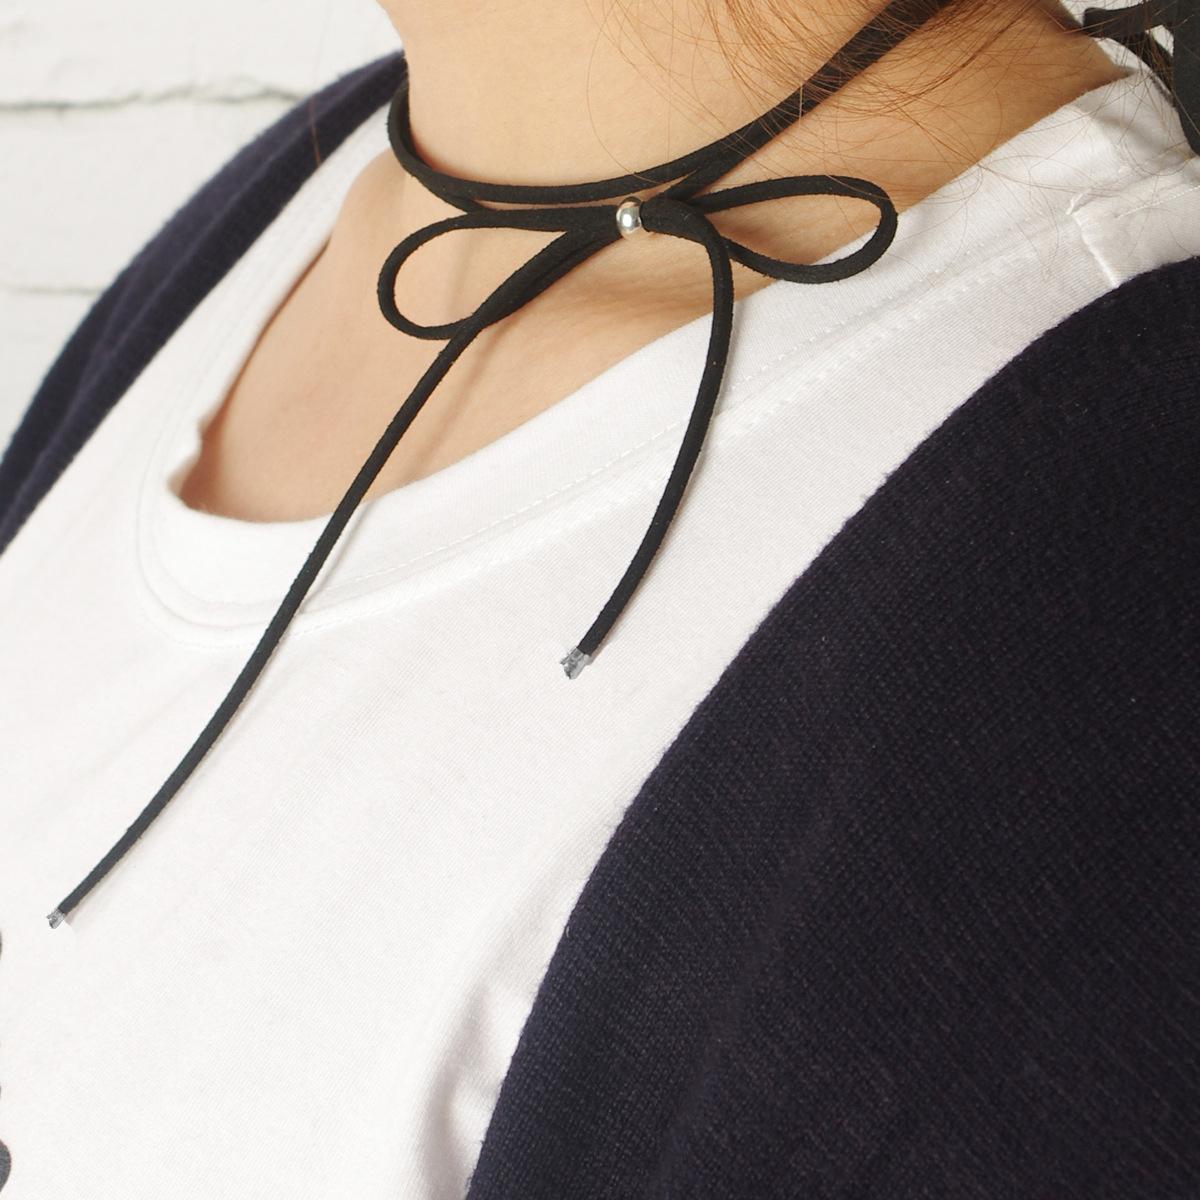 Womens Bow Knotted Korean Knit Cute bow Choker XR190430120079